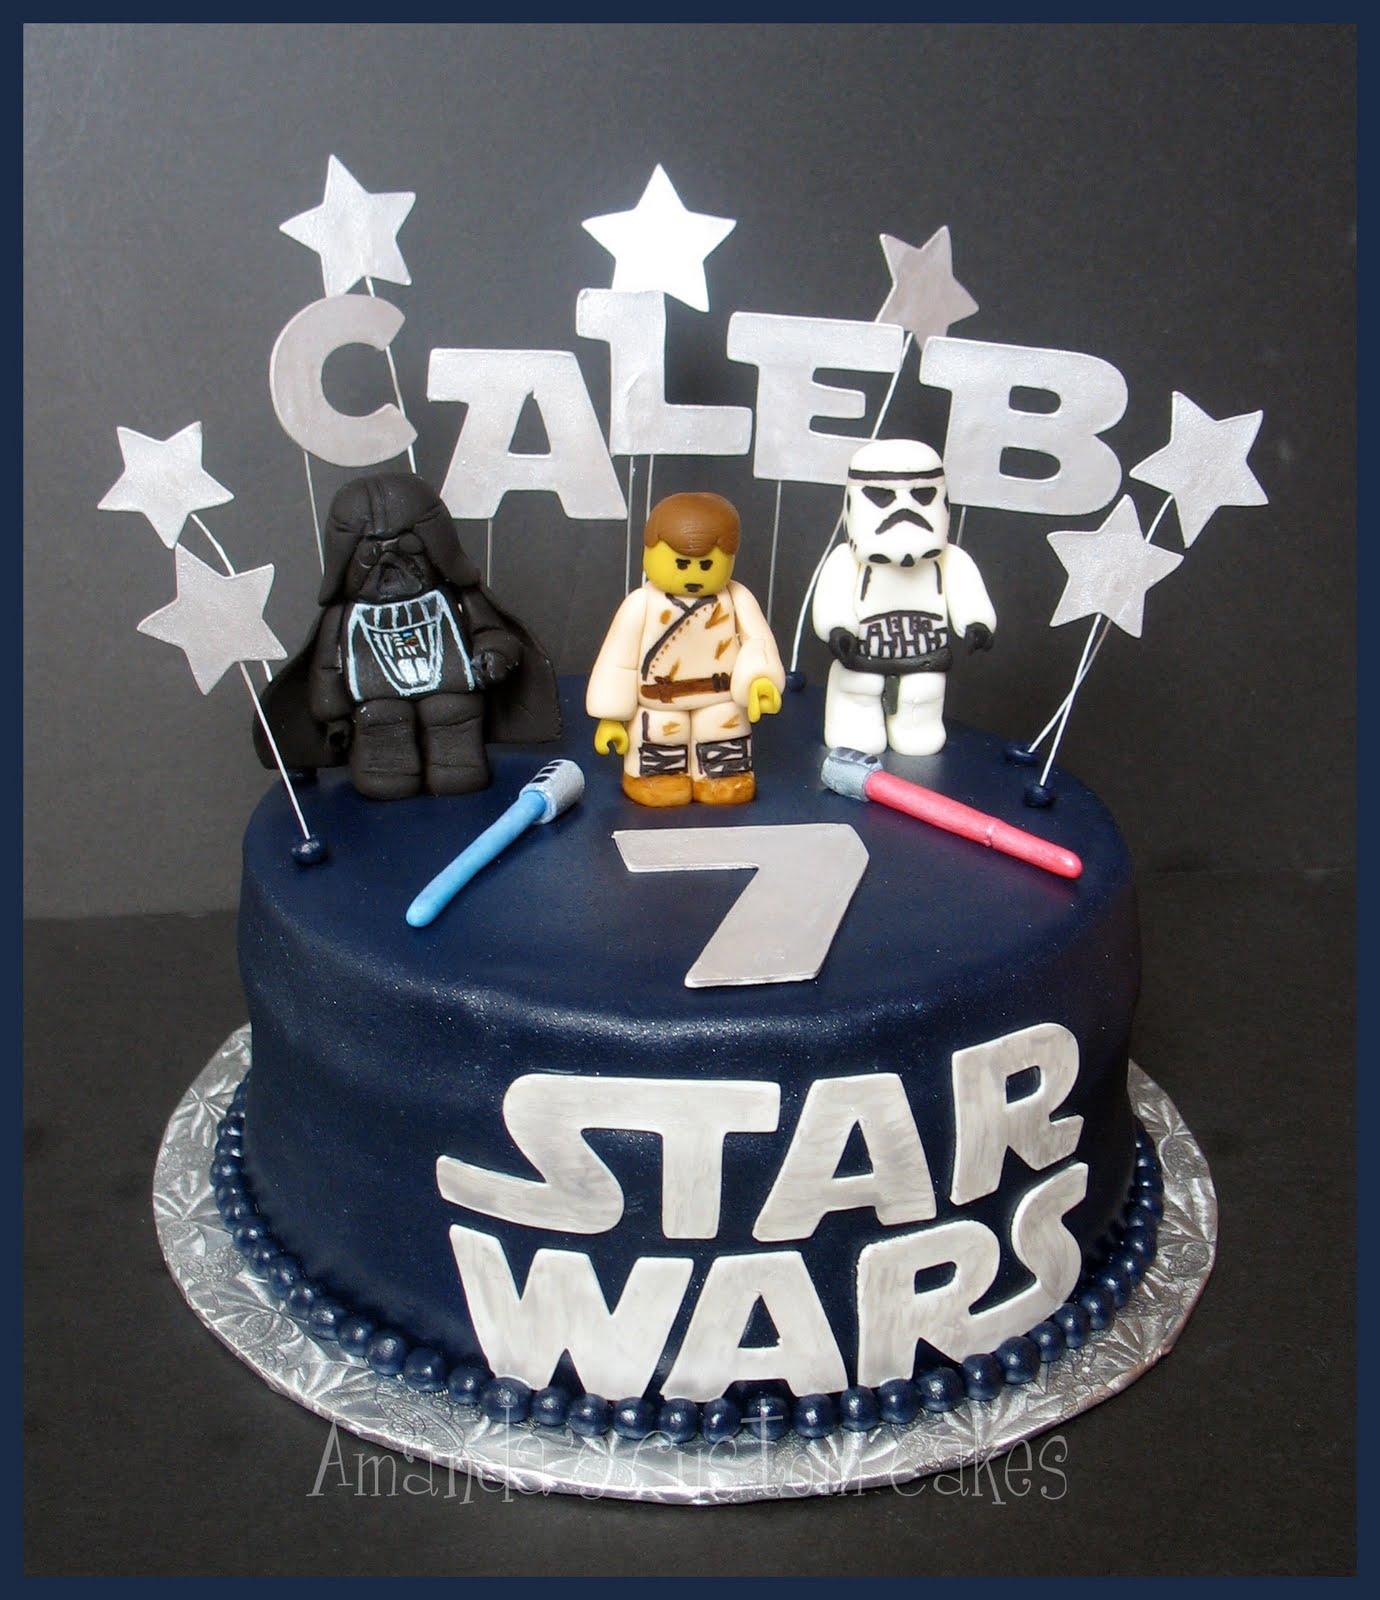 Amanda S Custom Cakes Lego Star Wars